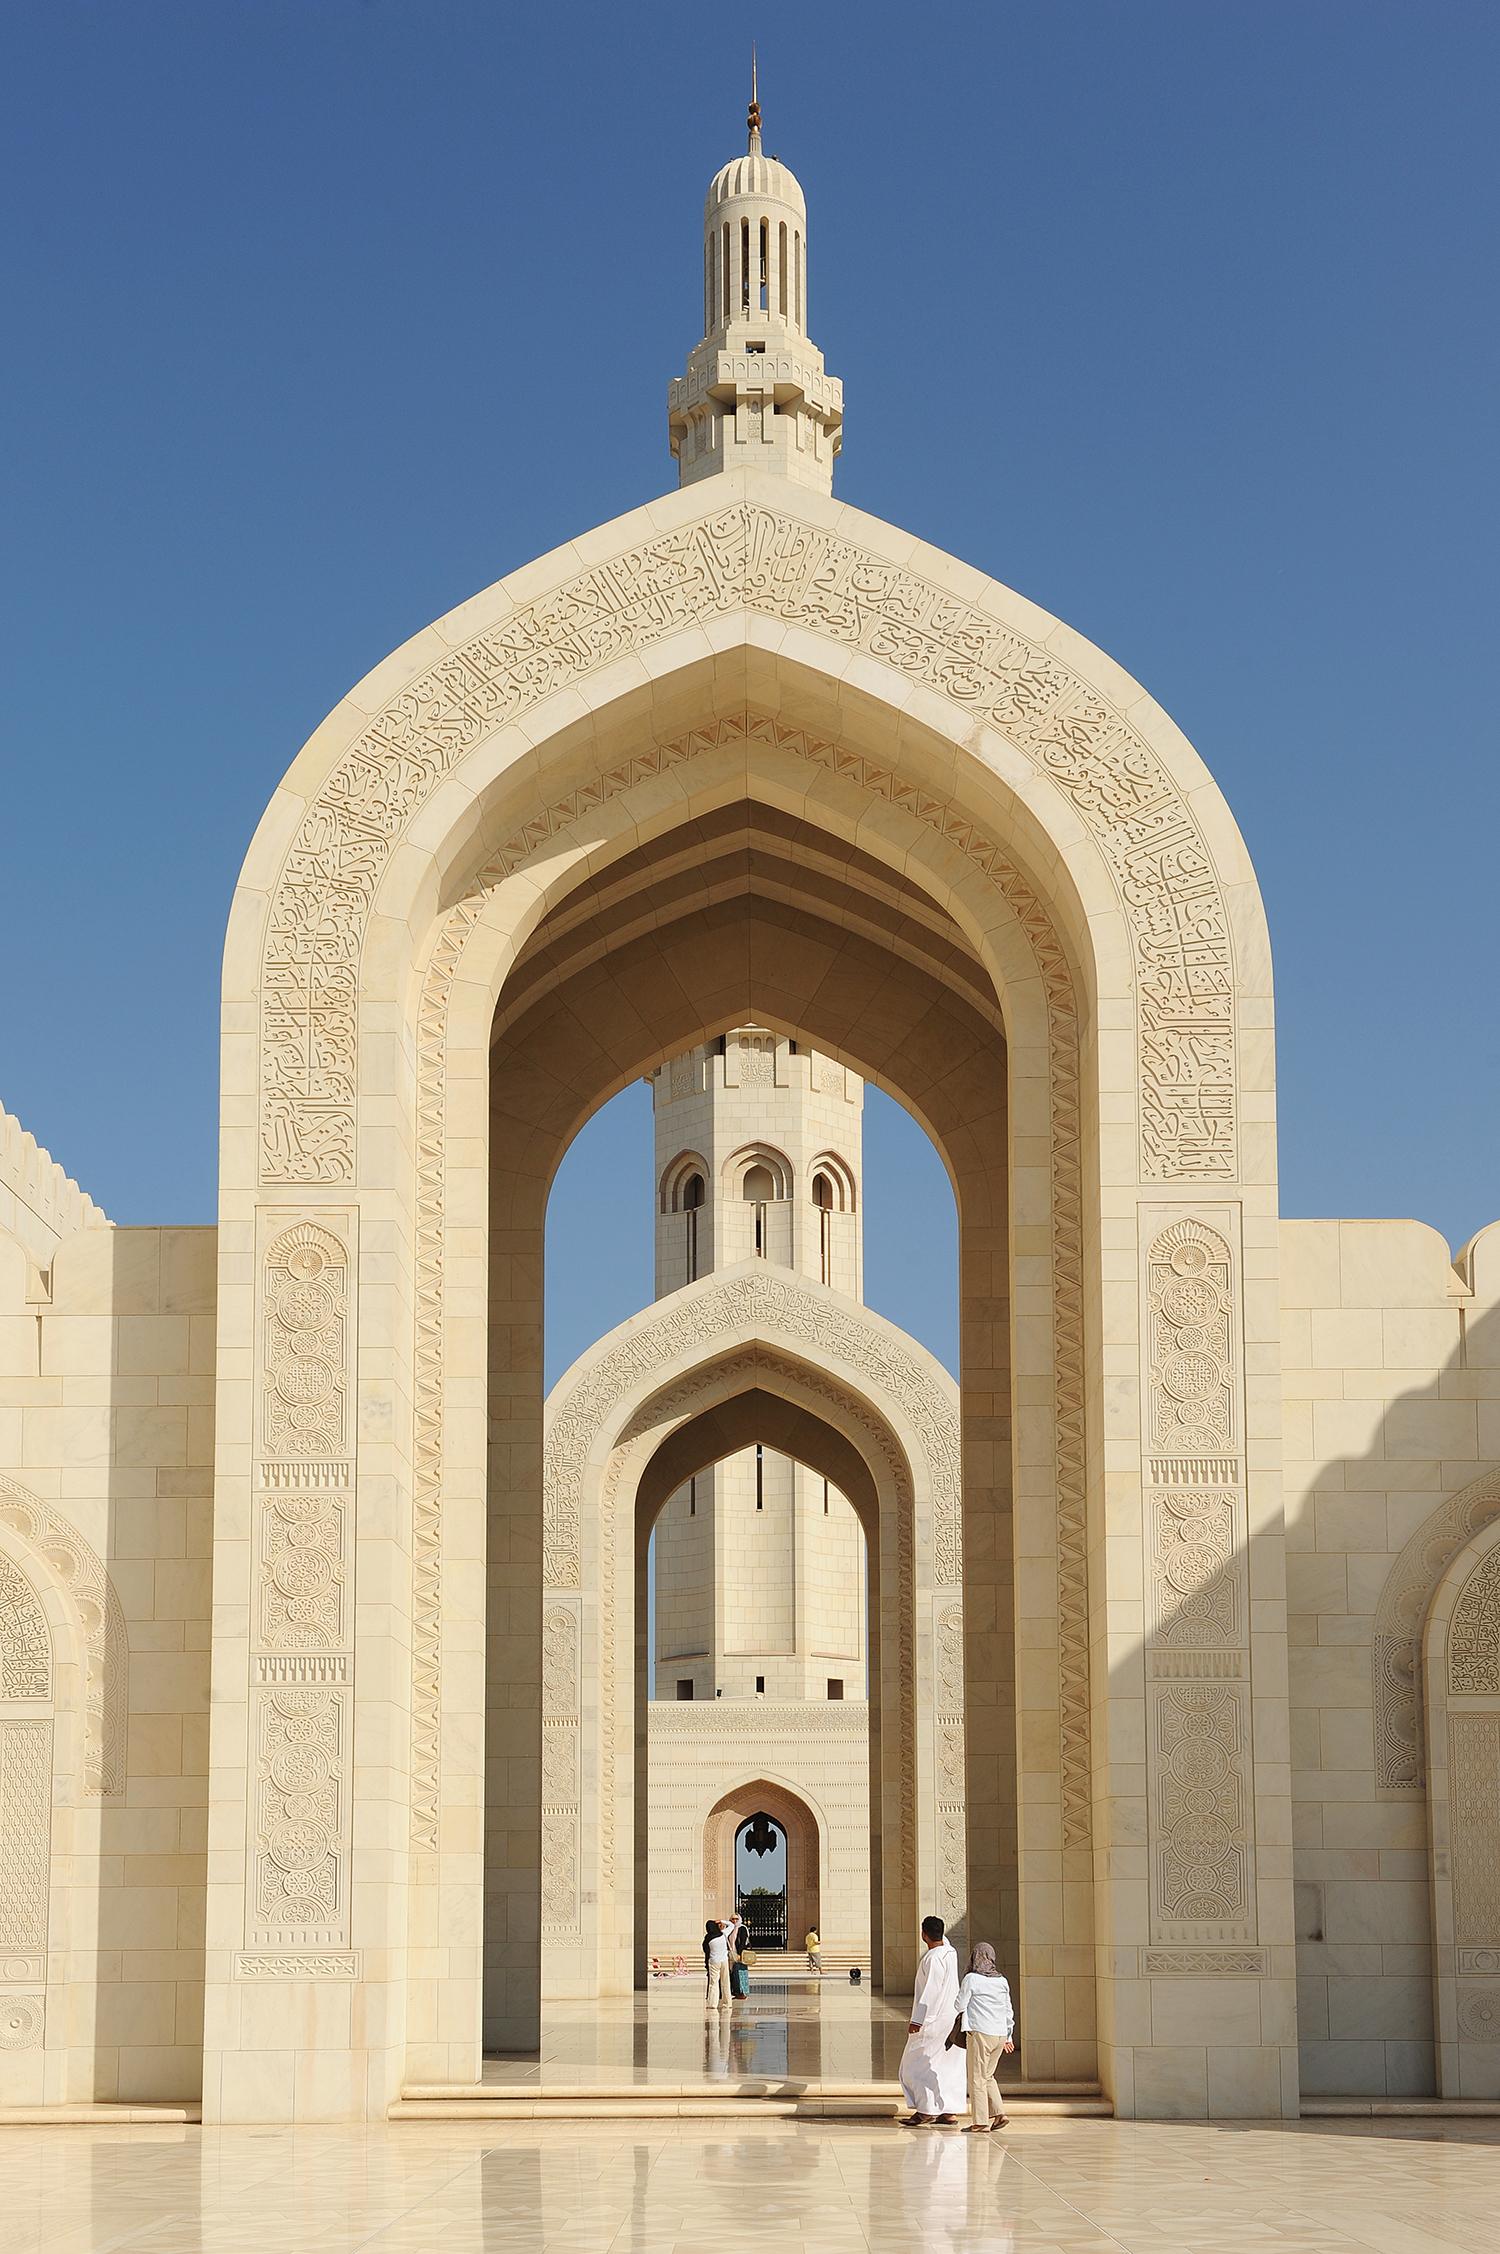 Oman, Muscat, Masqat, moskeija, Sultan Qaboos Grand Mosque